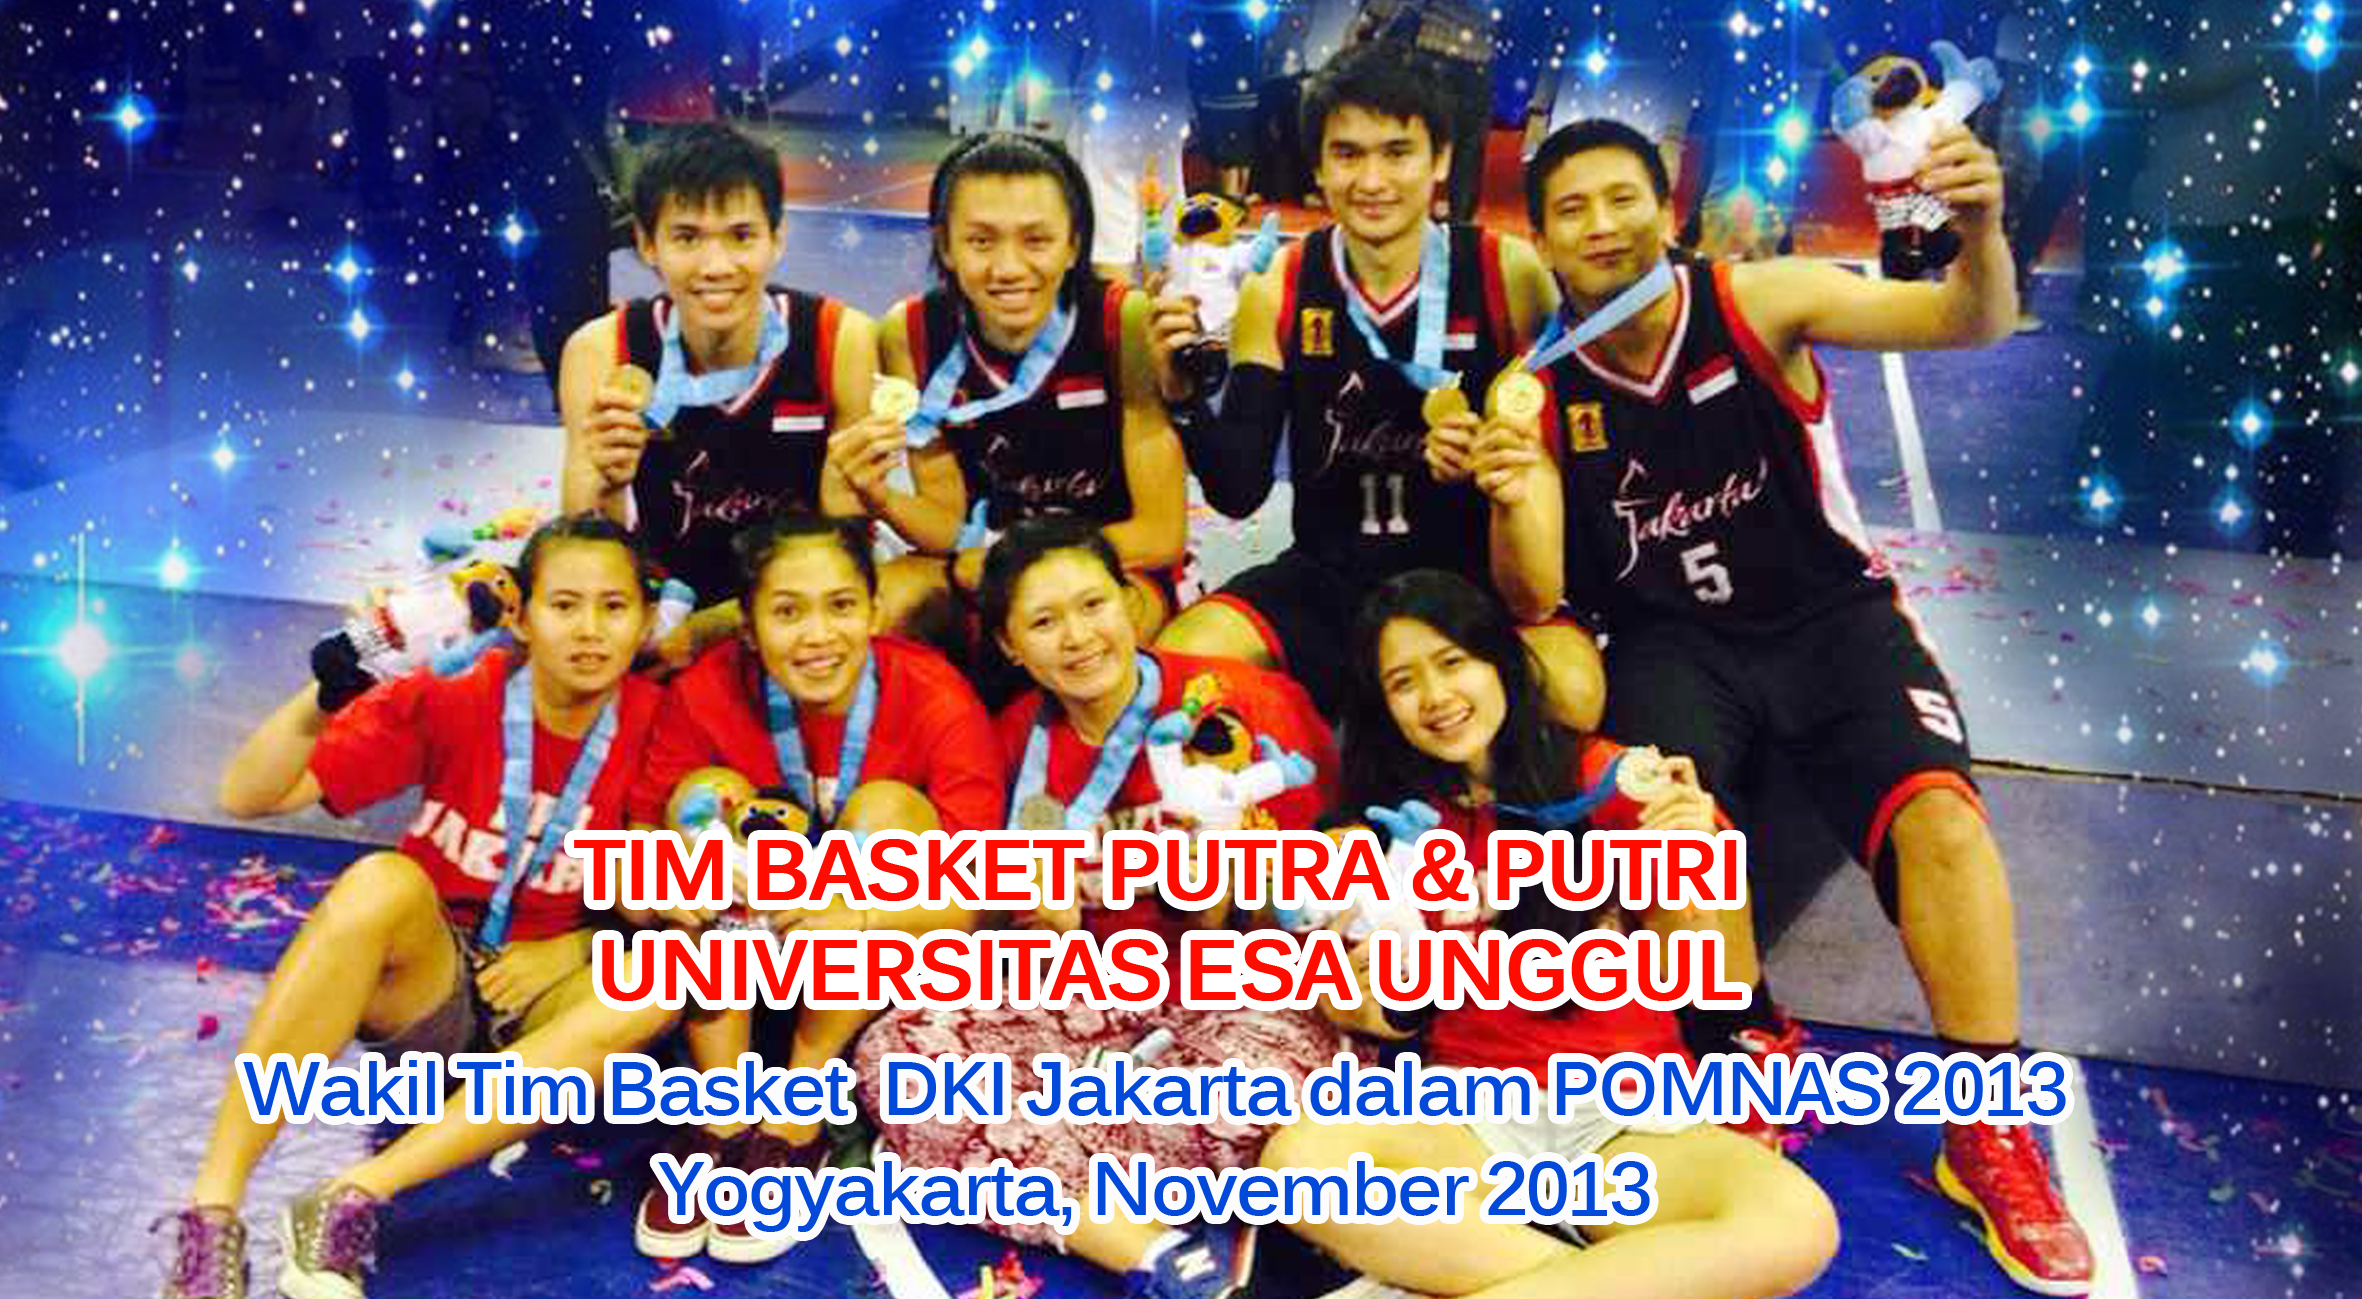 Tim Basket Putra dan Putri Universitas Esa Unggul menjadi wakil Universitas Esa Unggul dalam Tim Basket DKI Jakarta pada Pekan Olahraga Mahasiswa Nasional (POMNAS) 2013